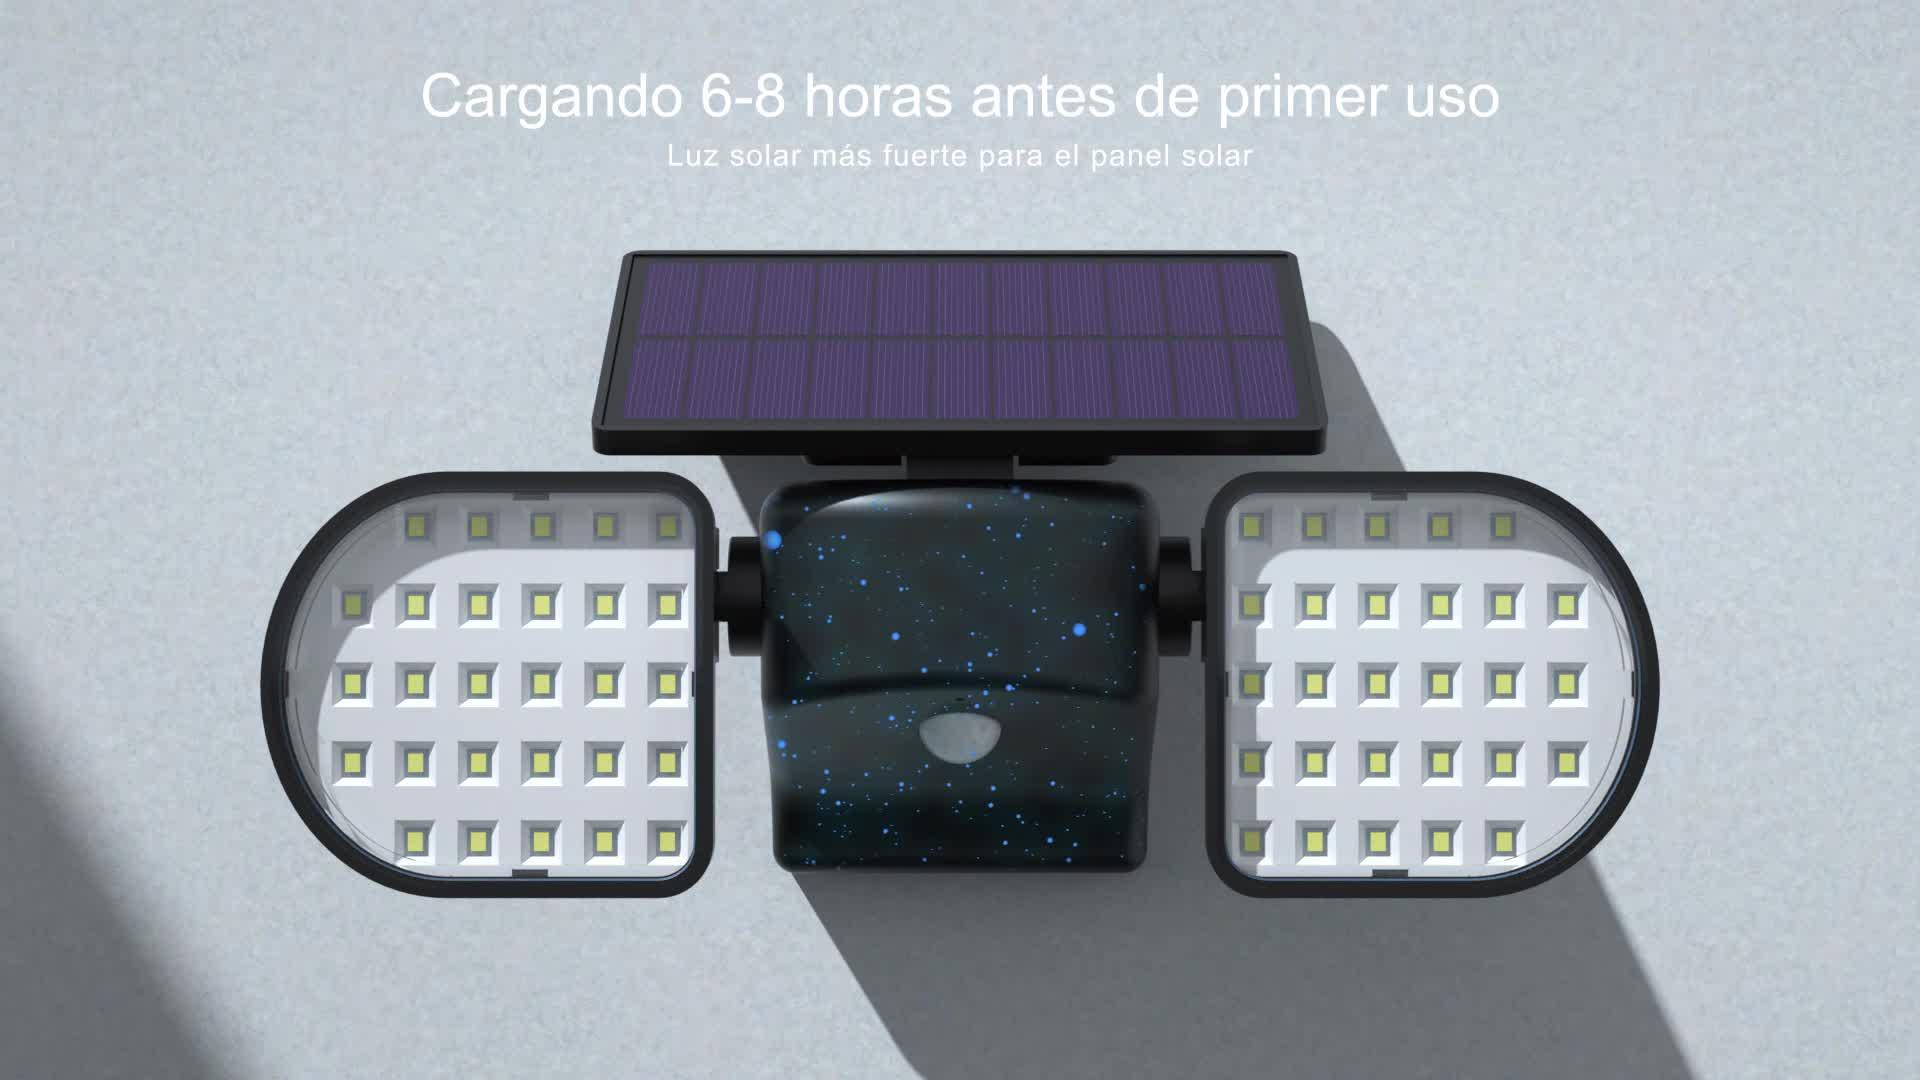 Luz Solar Exterior GolWof 230LED 3 Cabezas Lampara Solar Exterior con Sensor de Movimiento 270/º lluminaci/ón Foco Solar Exterior Potente IP65 Impermeable para Frente Jardin Garaje Camino Patio